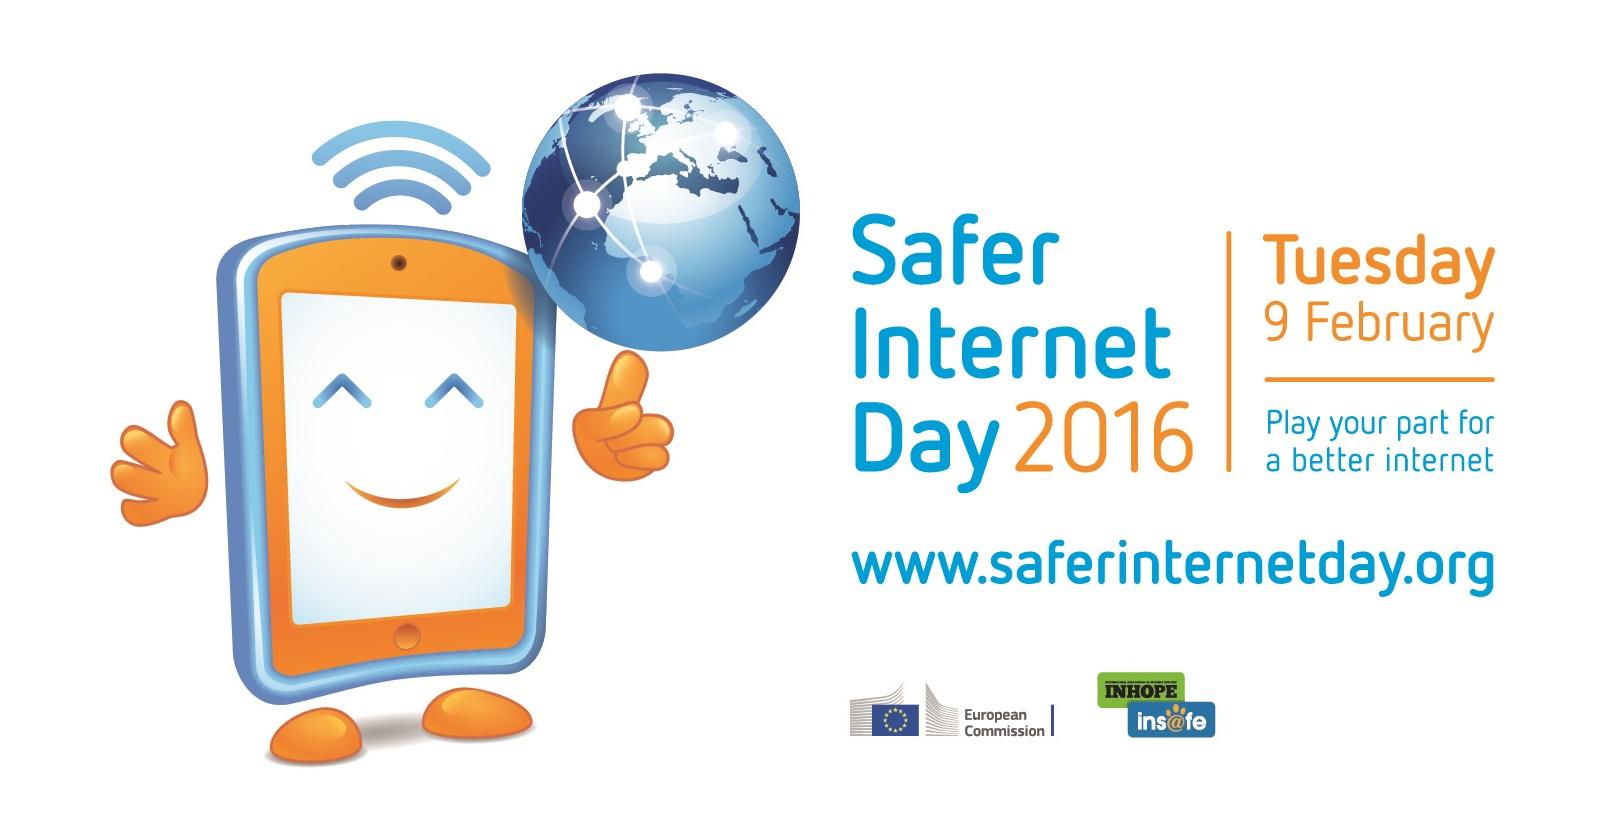 Safer Internet Day 2016 logo